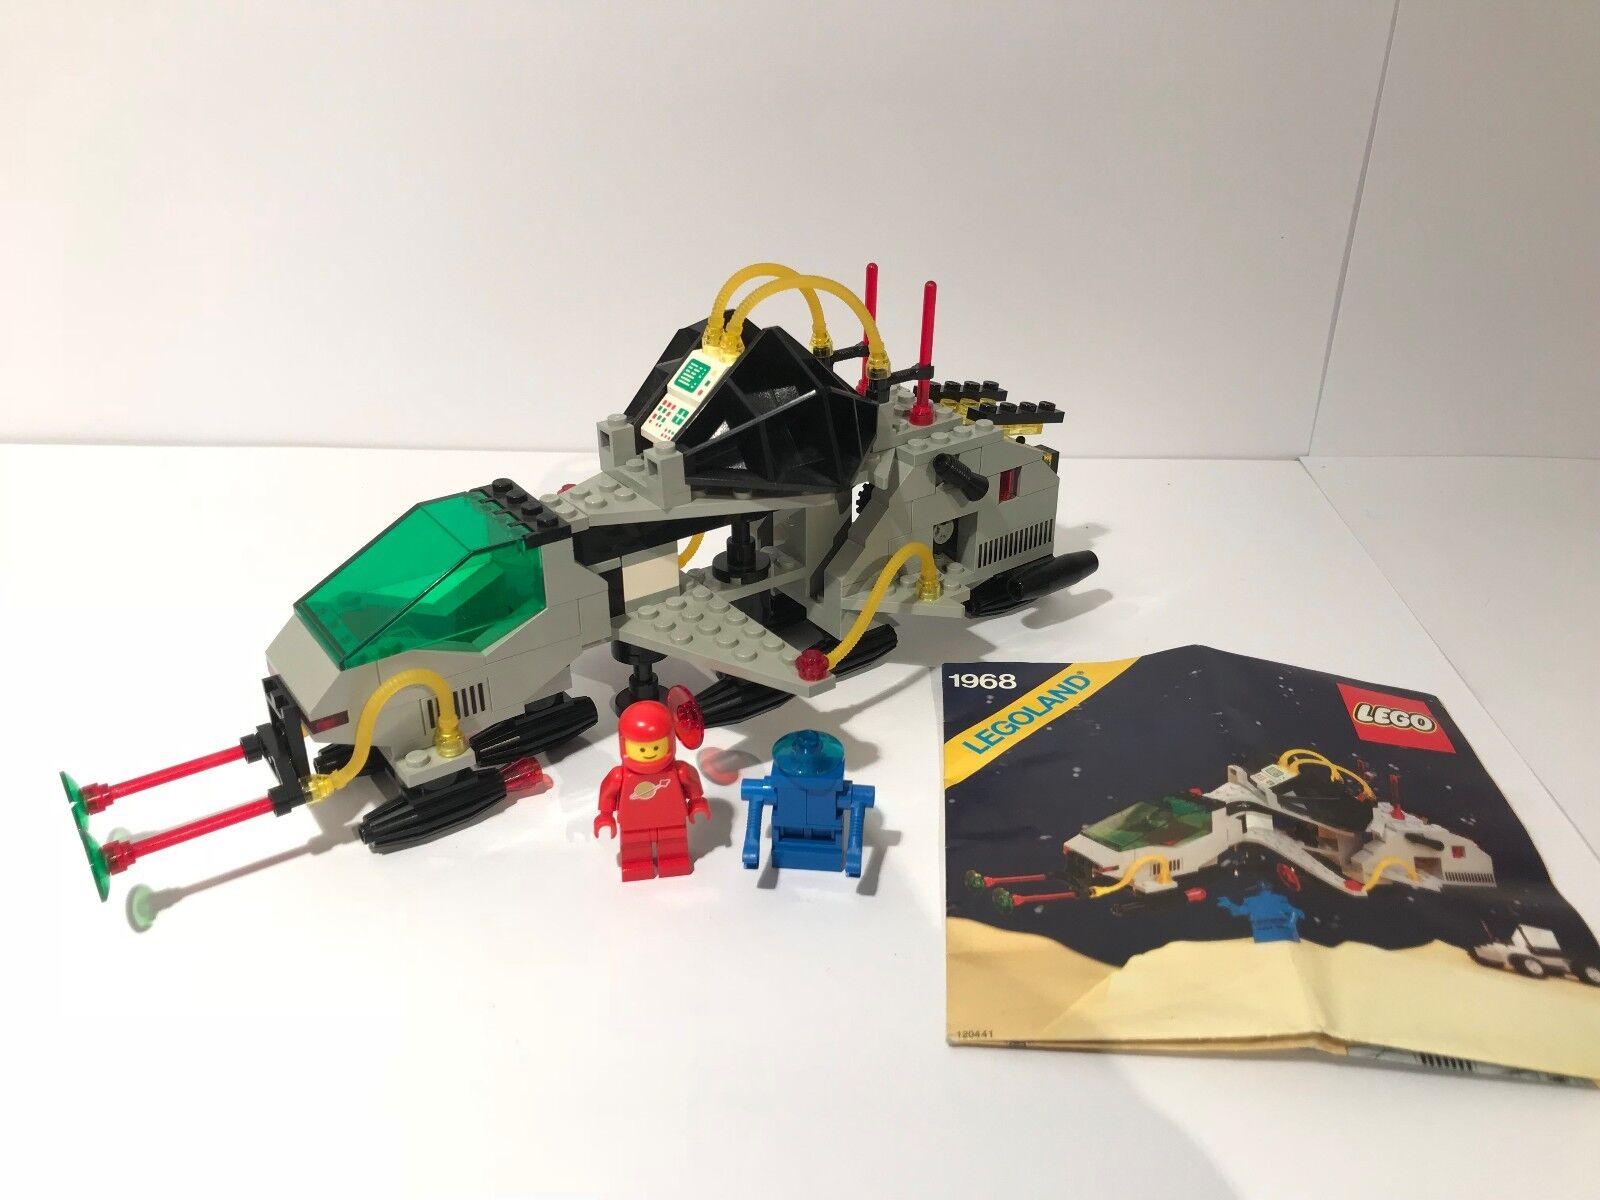 LEGO ® Legoland Space Classic 1968 UNKNOWN Set 80 80 80 er Selten mit Original BA e3161c